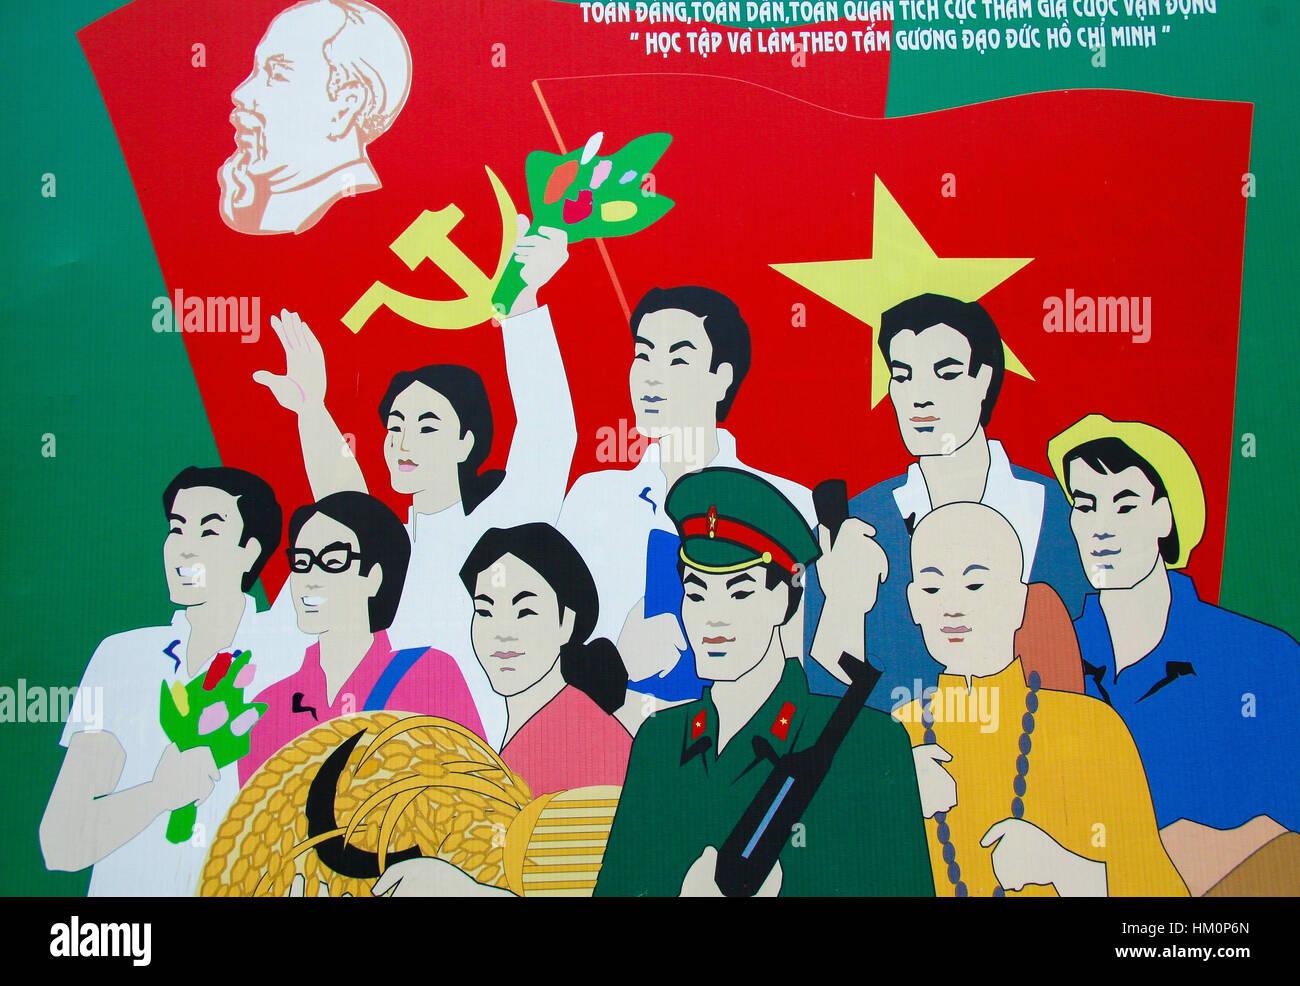 Vietnam War Propaganda Poster Stock Photos & Vietnam War